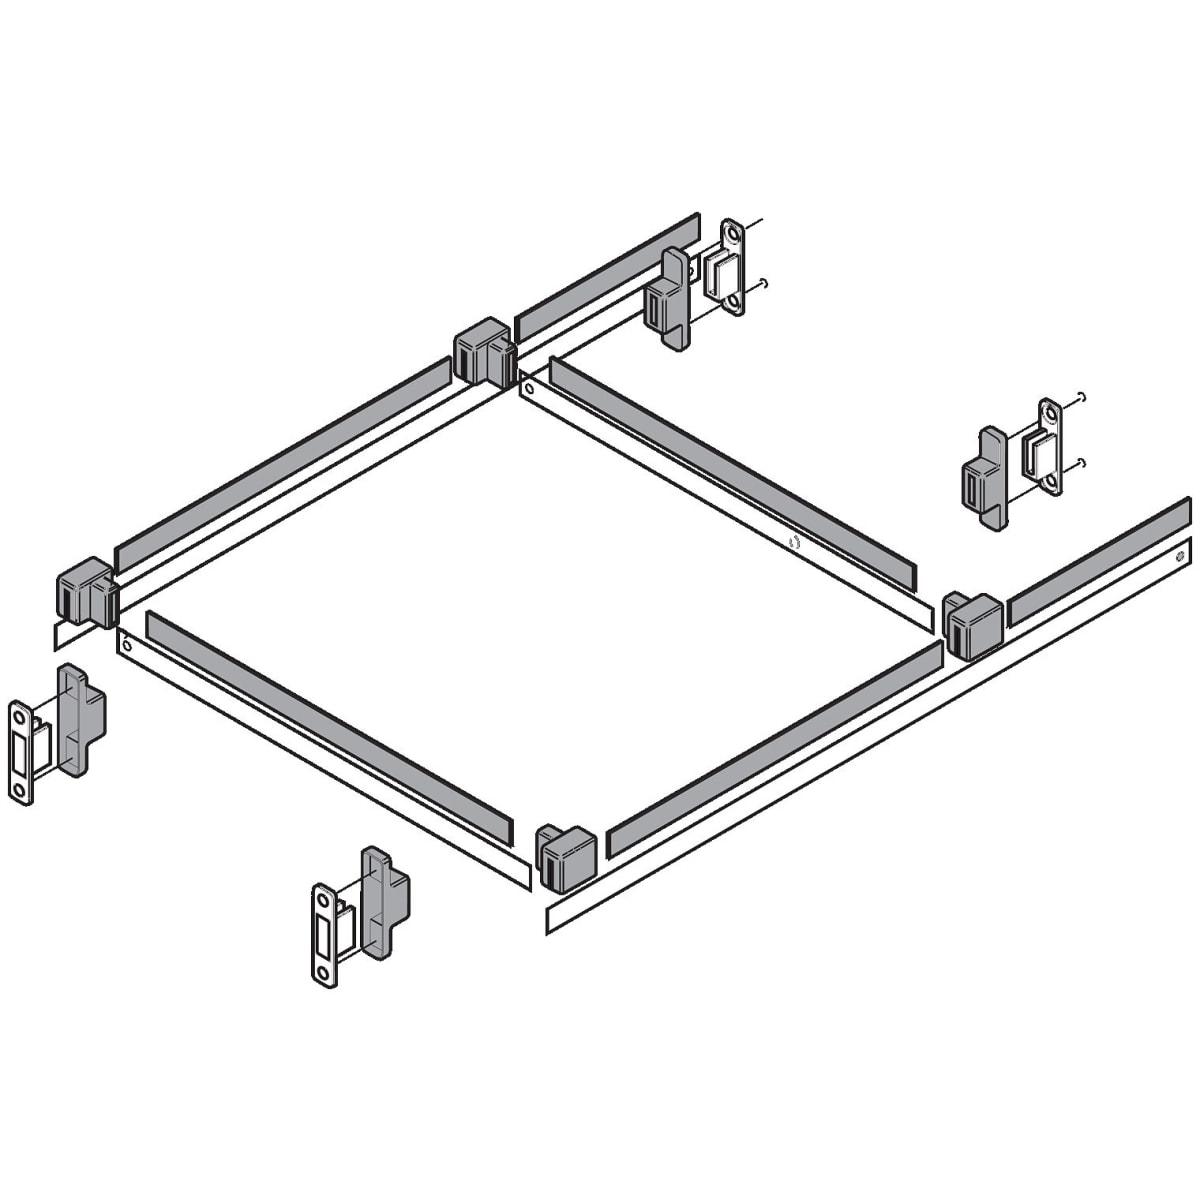 Blum ZRM.0005 METABOX Hanging Rail Support for METAFILE Natural